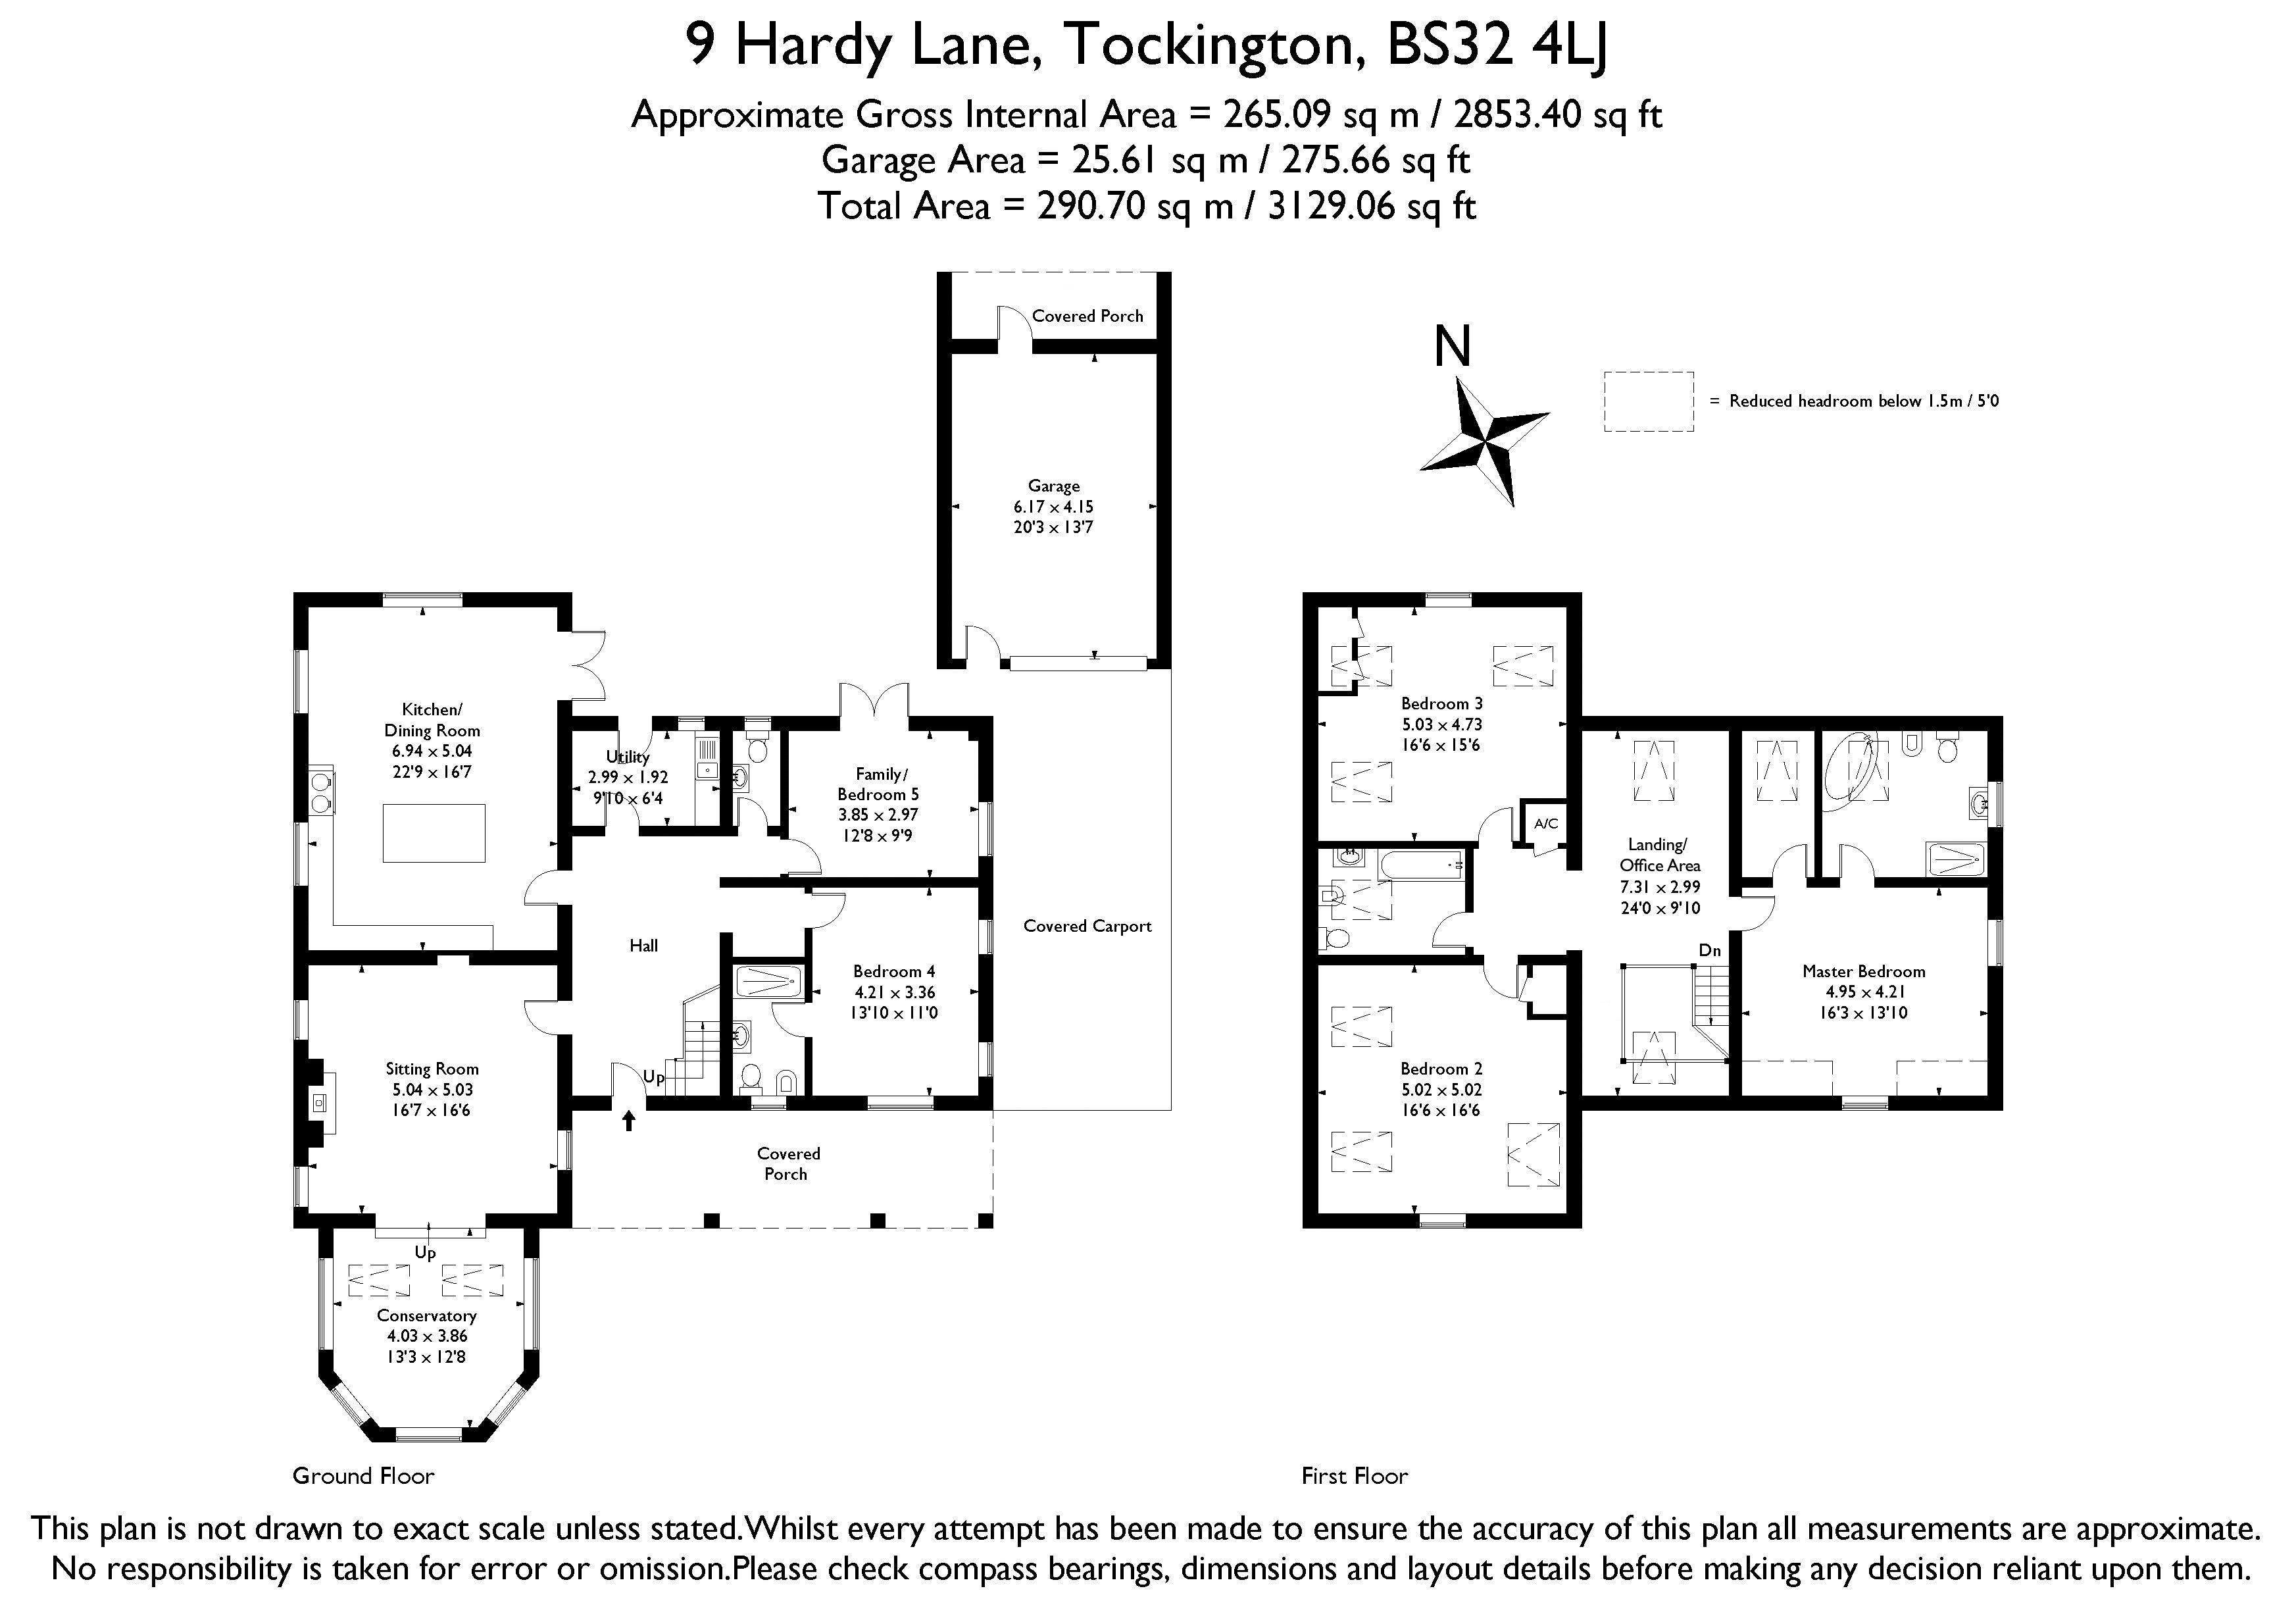 Hardy Lane Tockington